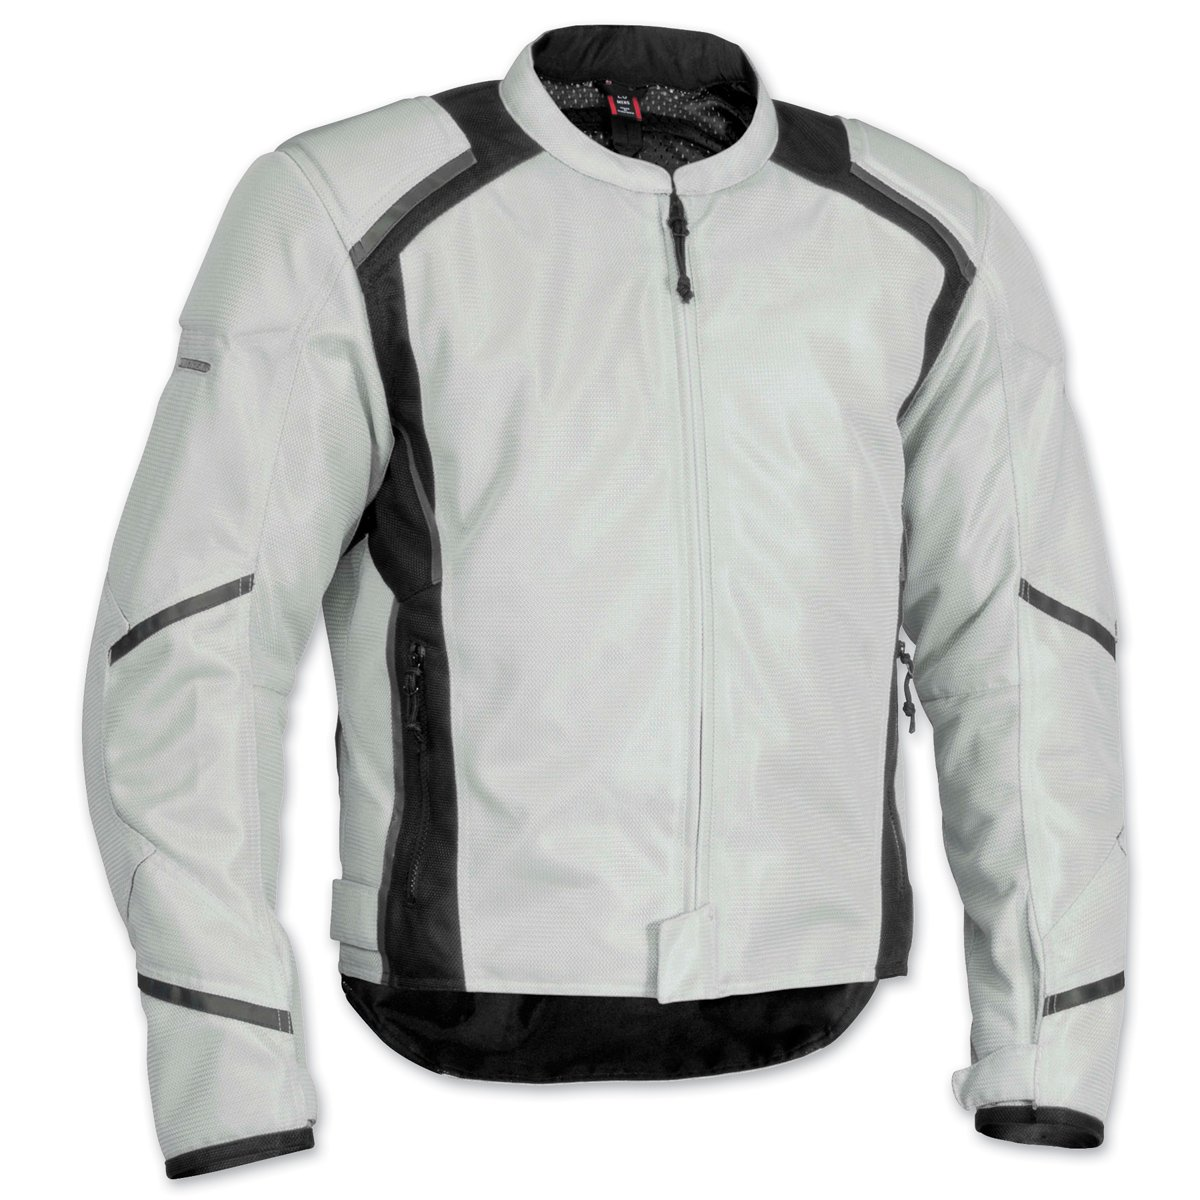 FirstGear Mesh Tex Men's Mesh Sports Bike Motorcycle Jacket - Silver/Black - Tall X-Large